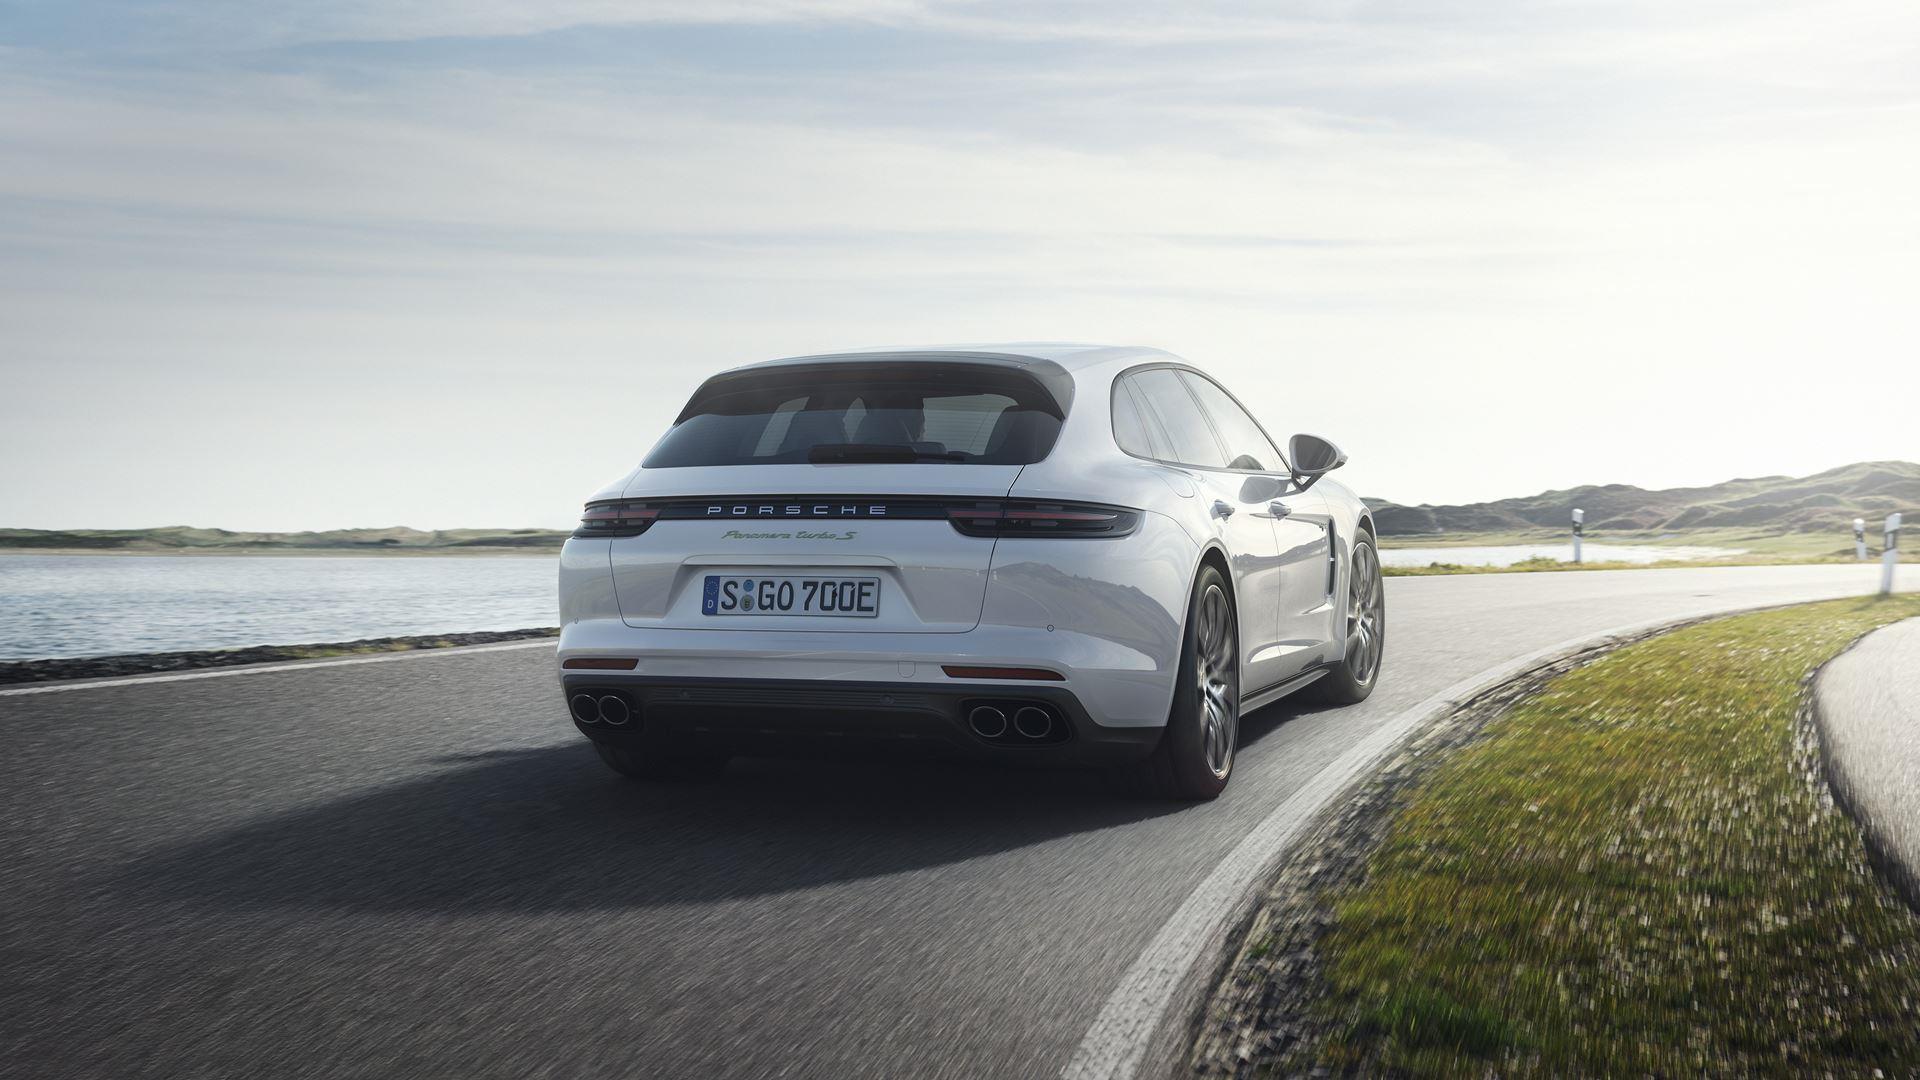 2018 Porsche Panamera Turbo S E Hybrid Sport Turismo Wallpapers Hd Drivespark